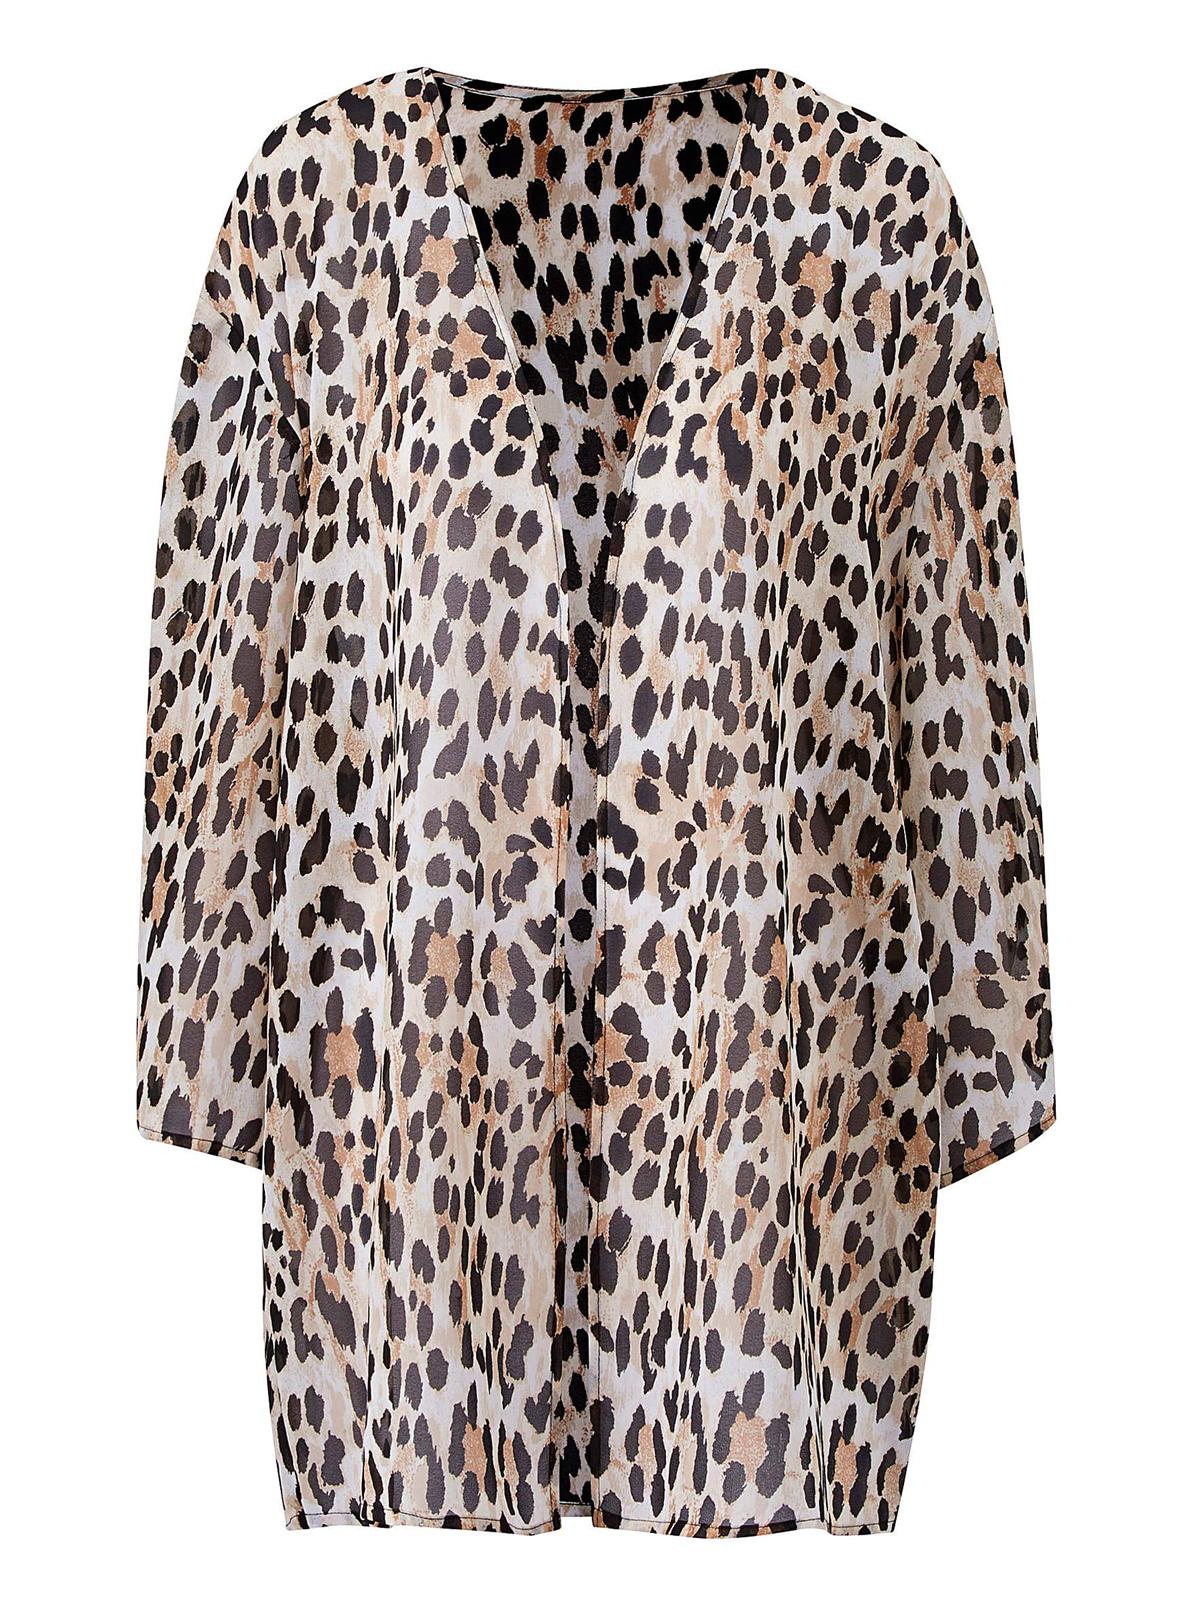 e9133ef8b1 Wholesale Plus Size Boutique Clothing by Anthology - - Anthology BROWN Animal  Print Kimono Cover-Up - Plus Size 14 to 20